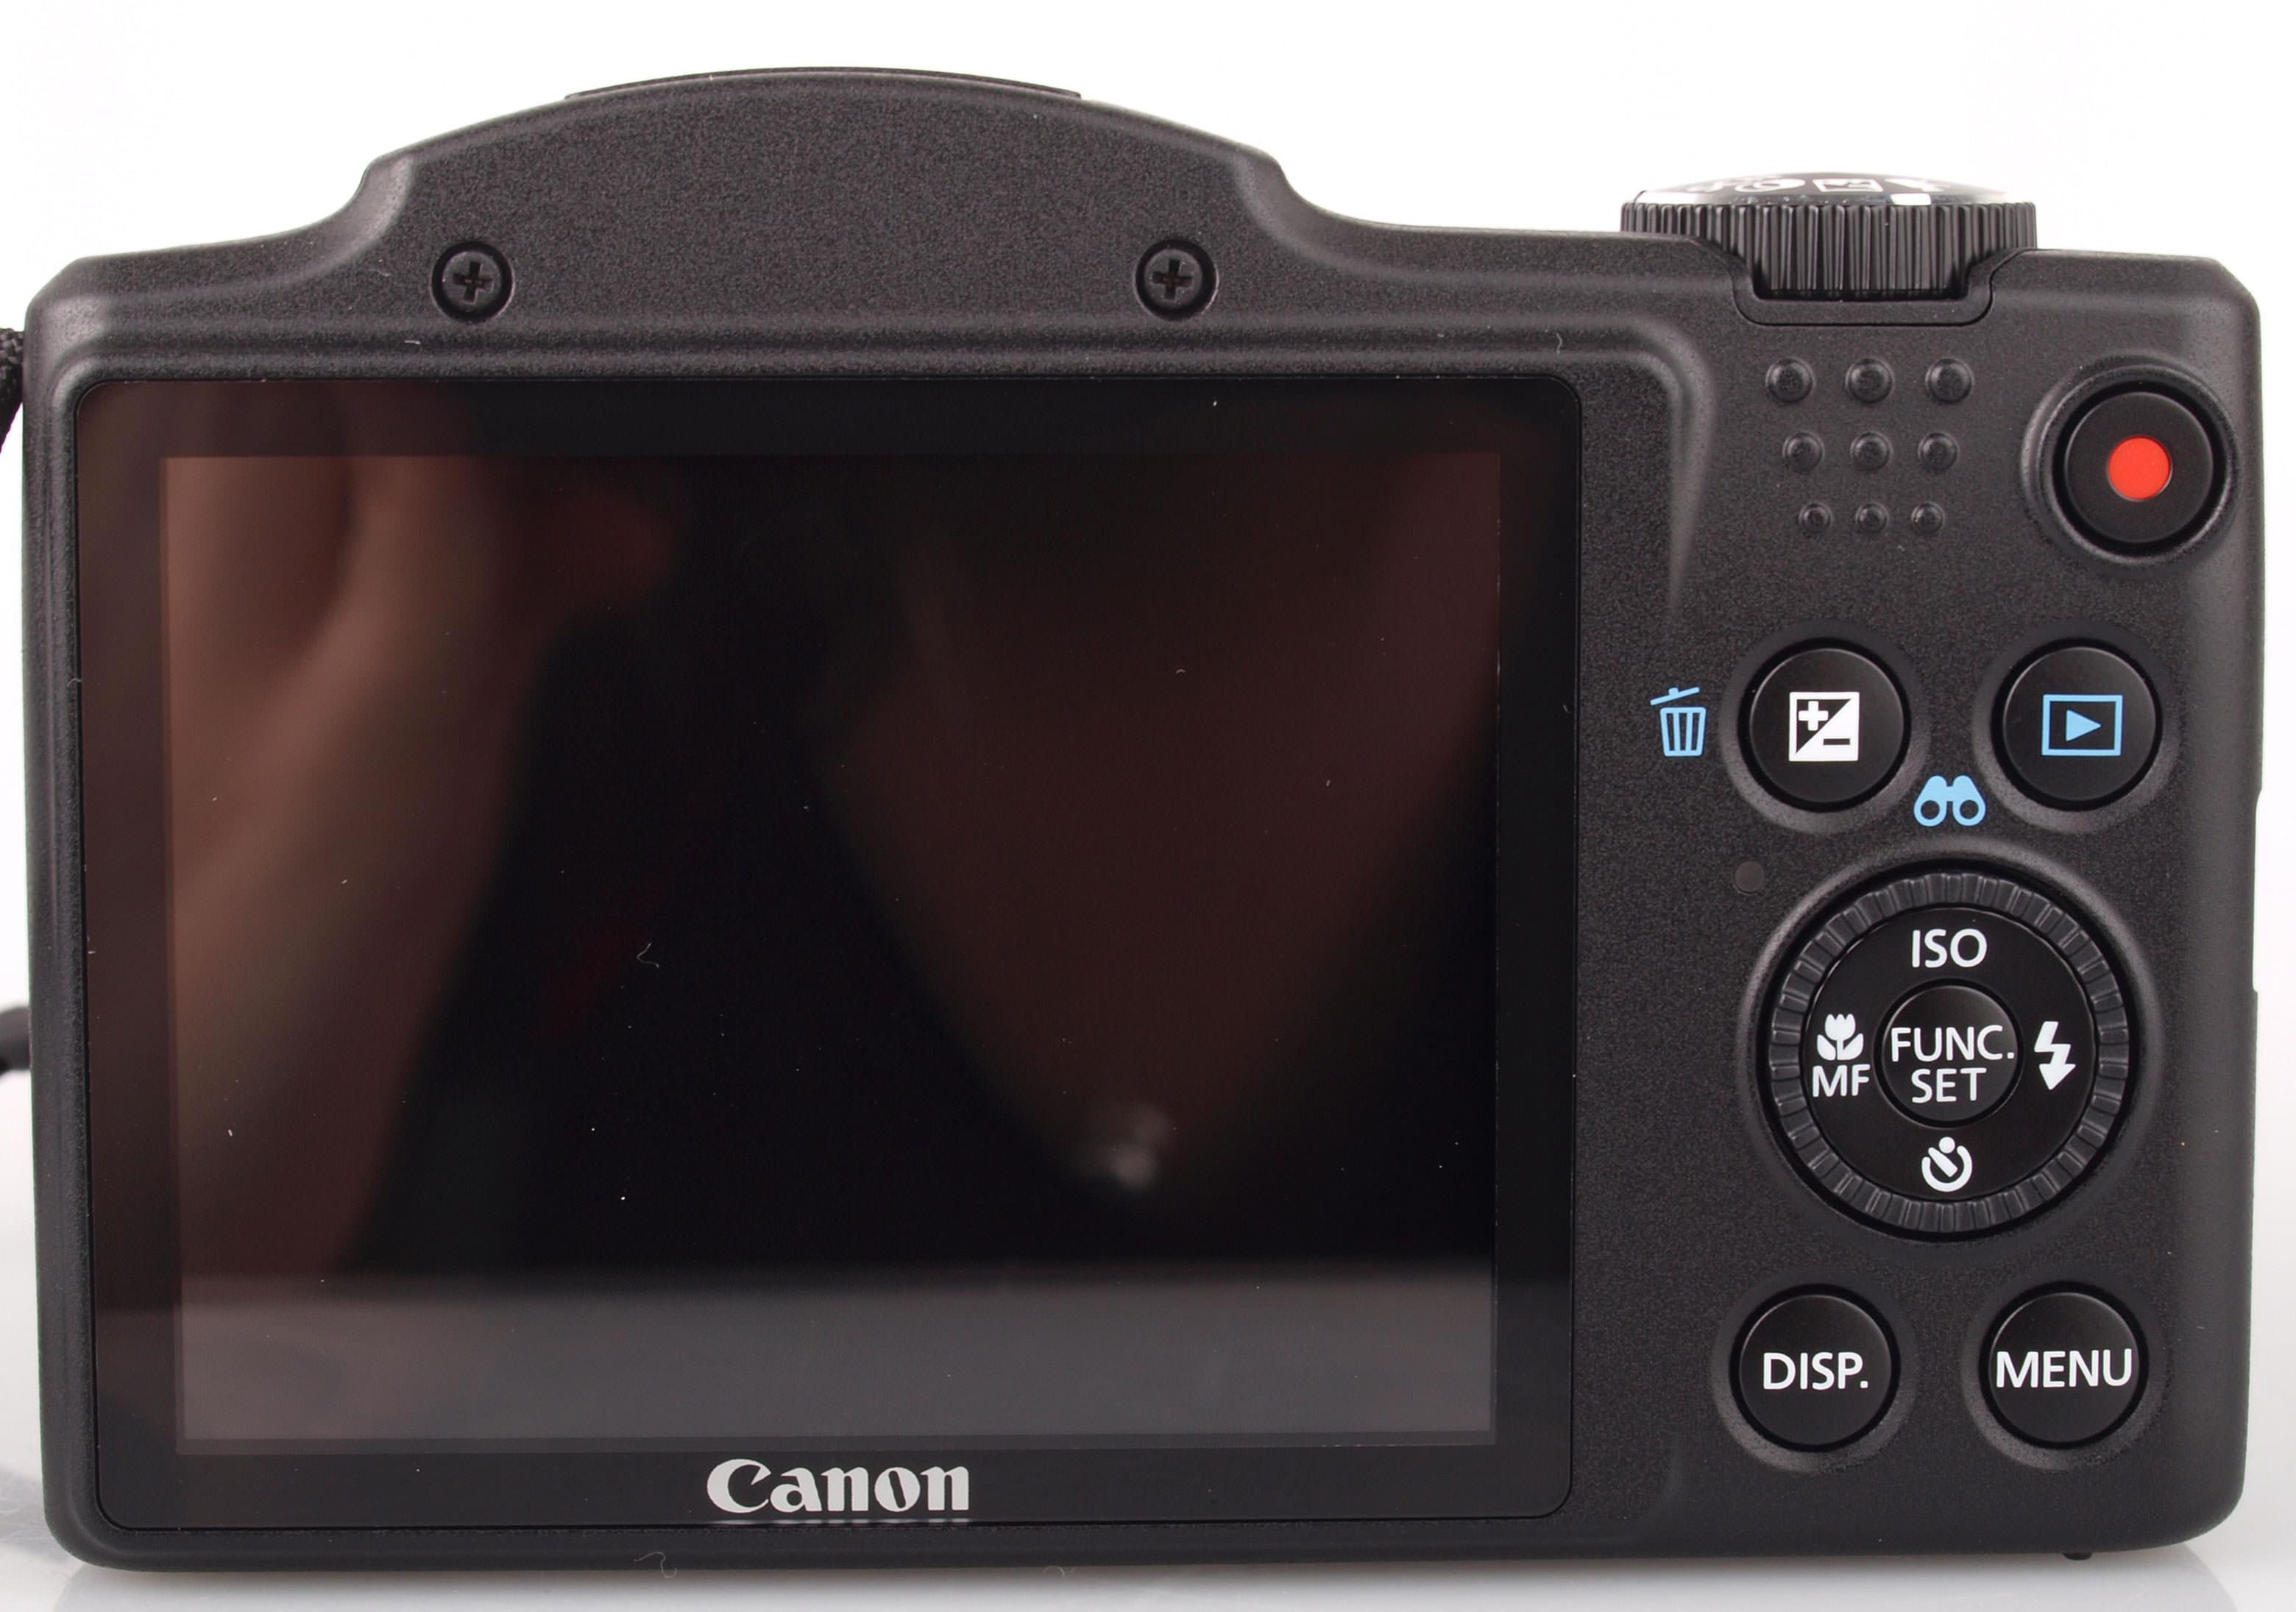 canon powershot sx130 is manual pdf rh bouwbedrijfdezeewering nl Canon Digital Camera Sx170is Canon PowerShot SX130